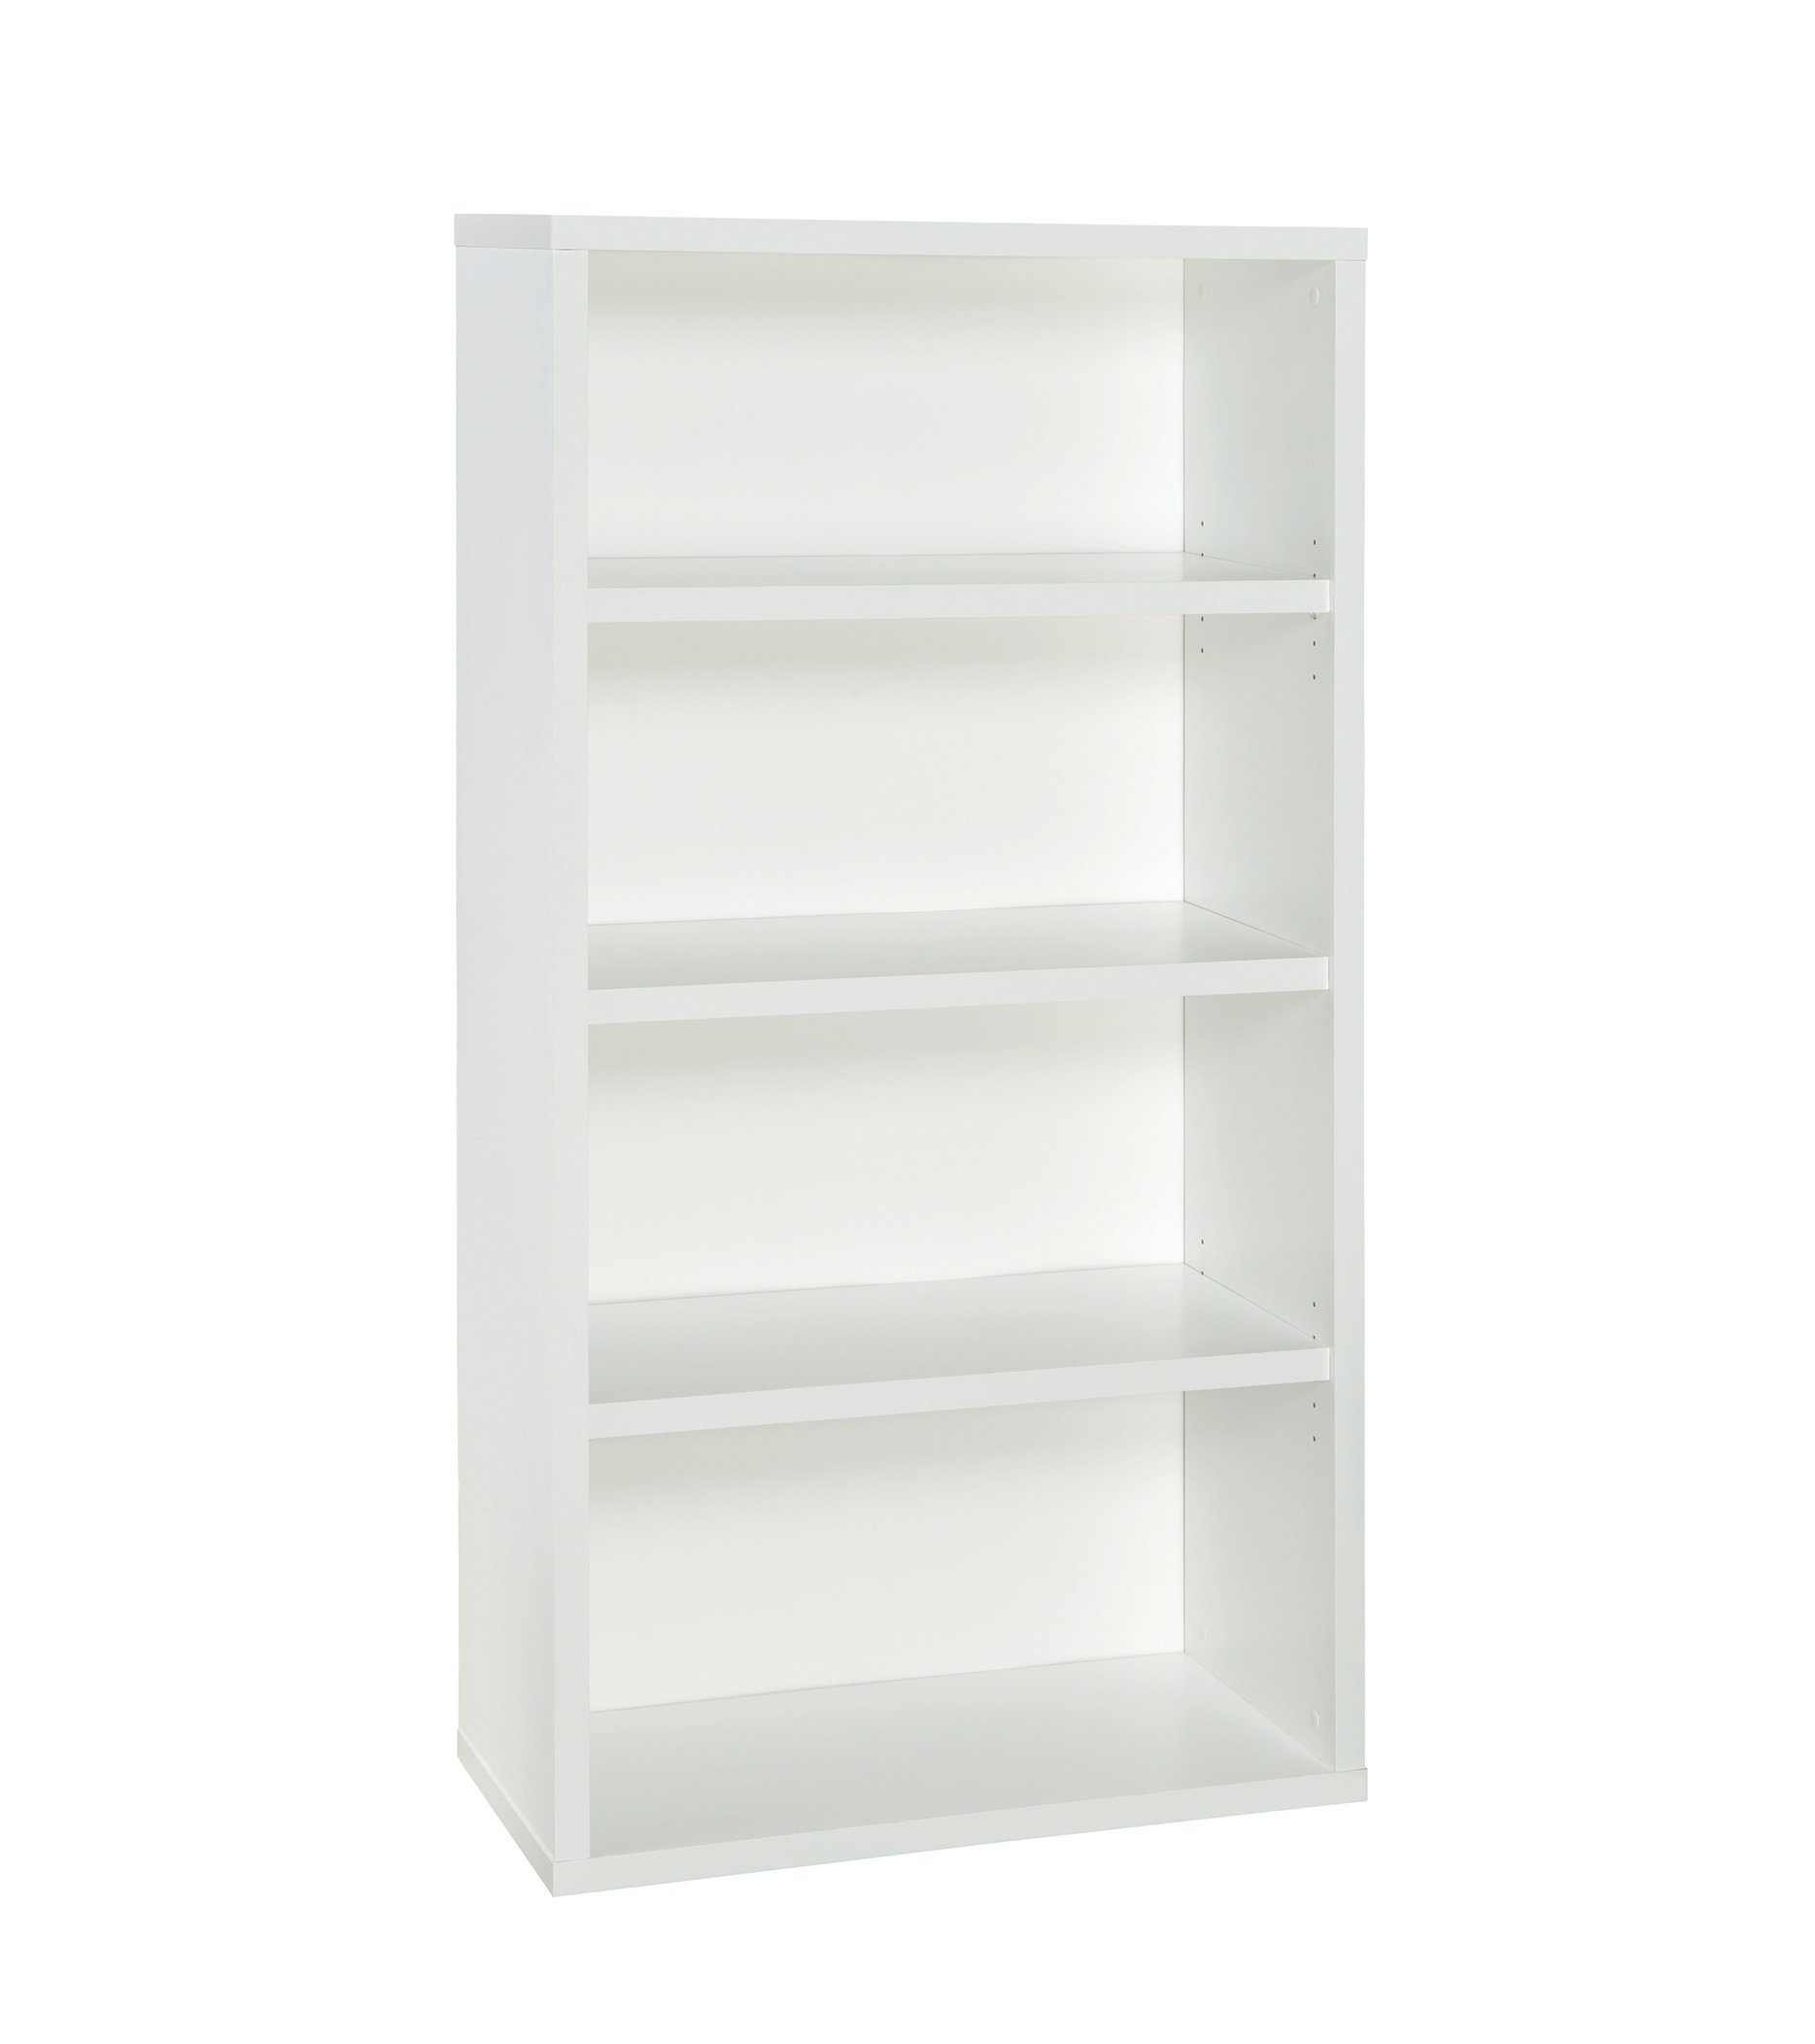 ClosetMaid 13503 Decorative 4-Shelf Premium Bookcase